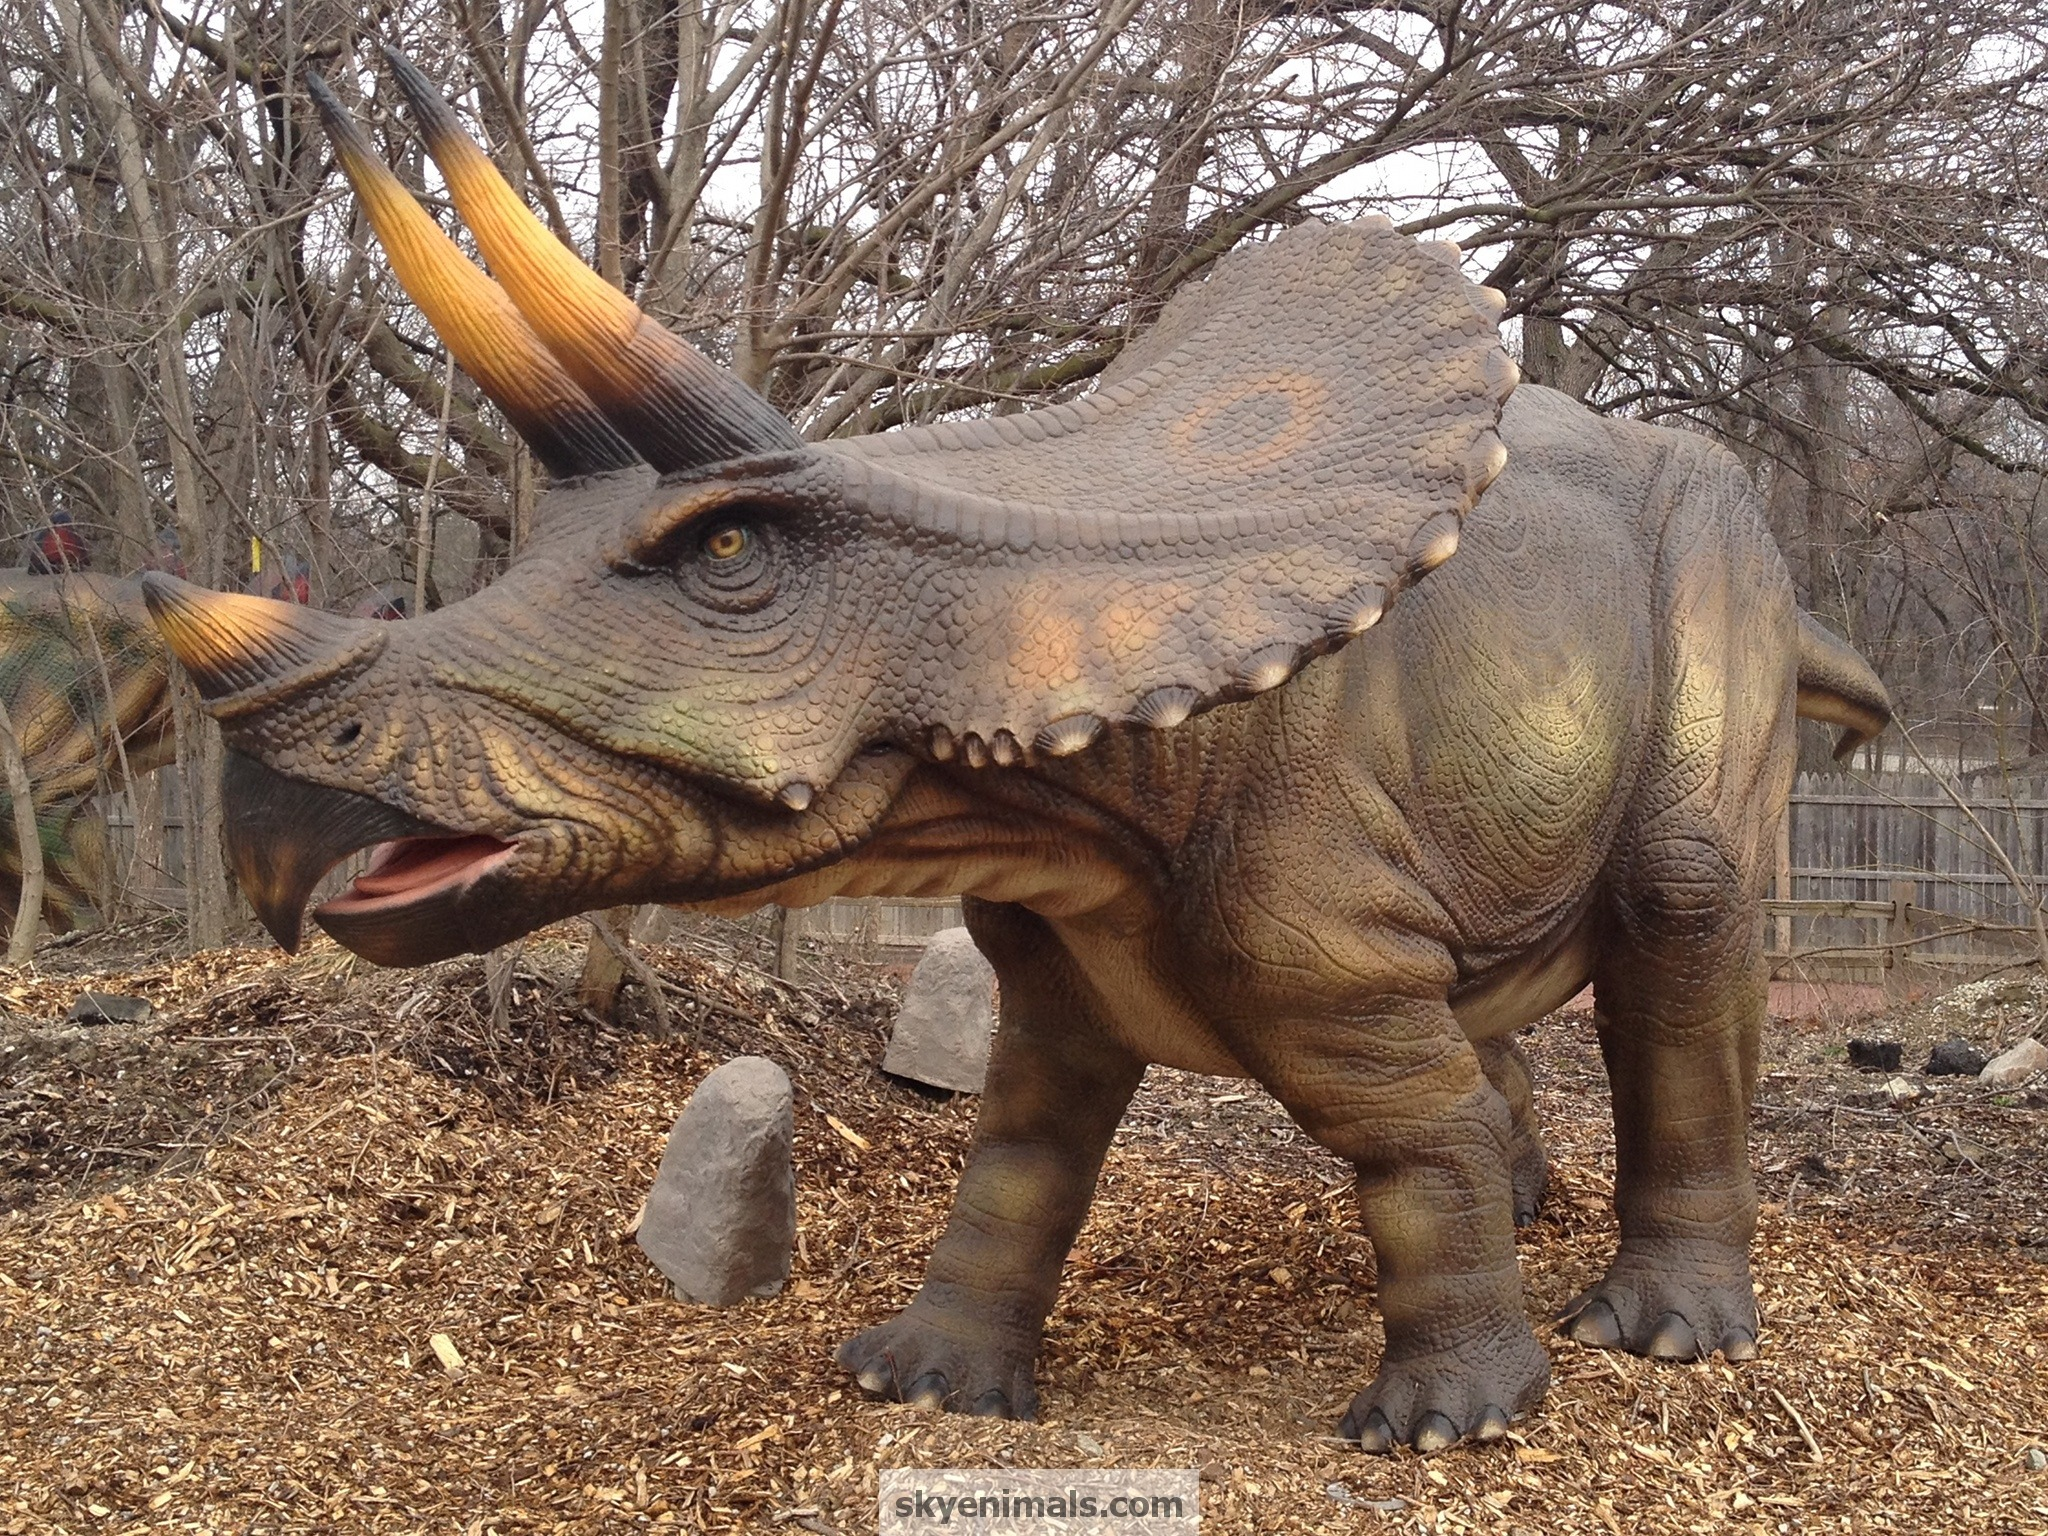 Triceratops Dinosaur Wallpaper Image